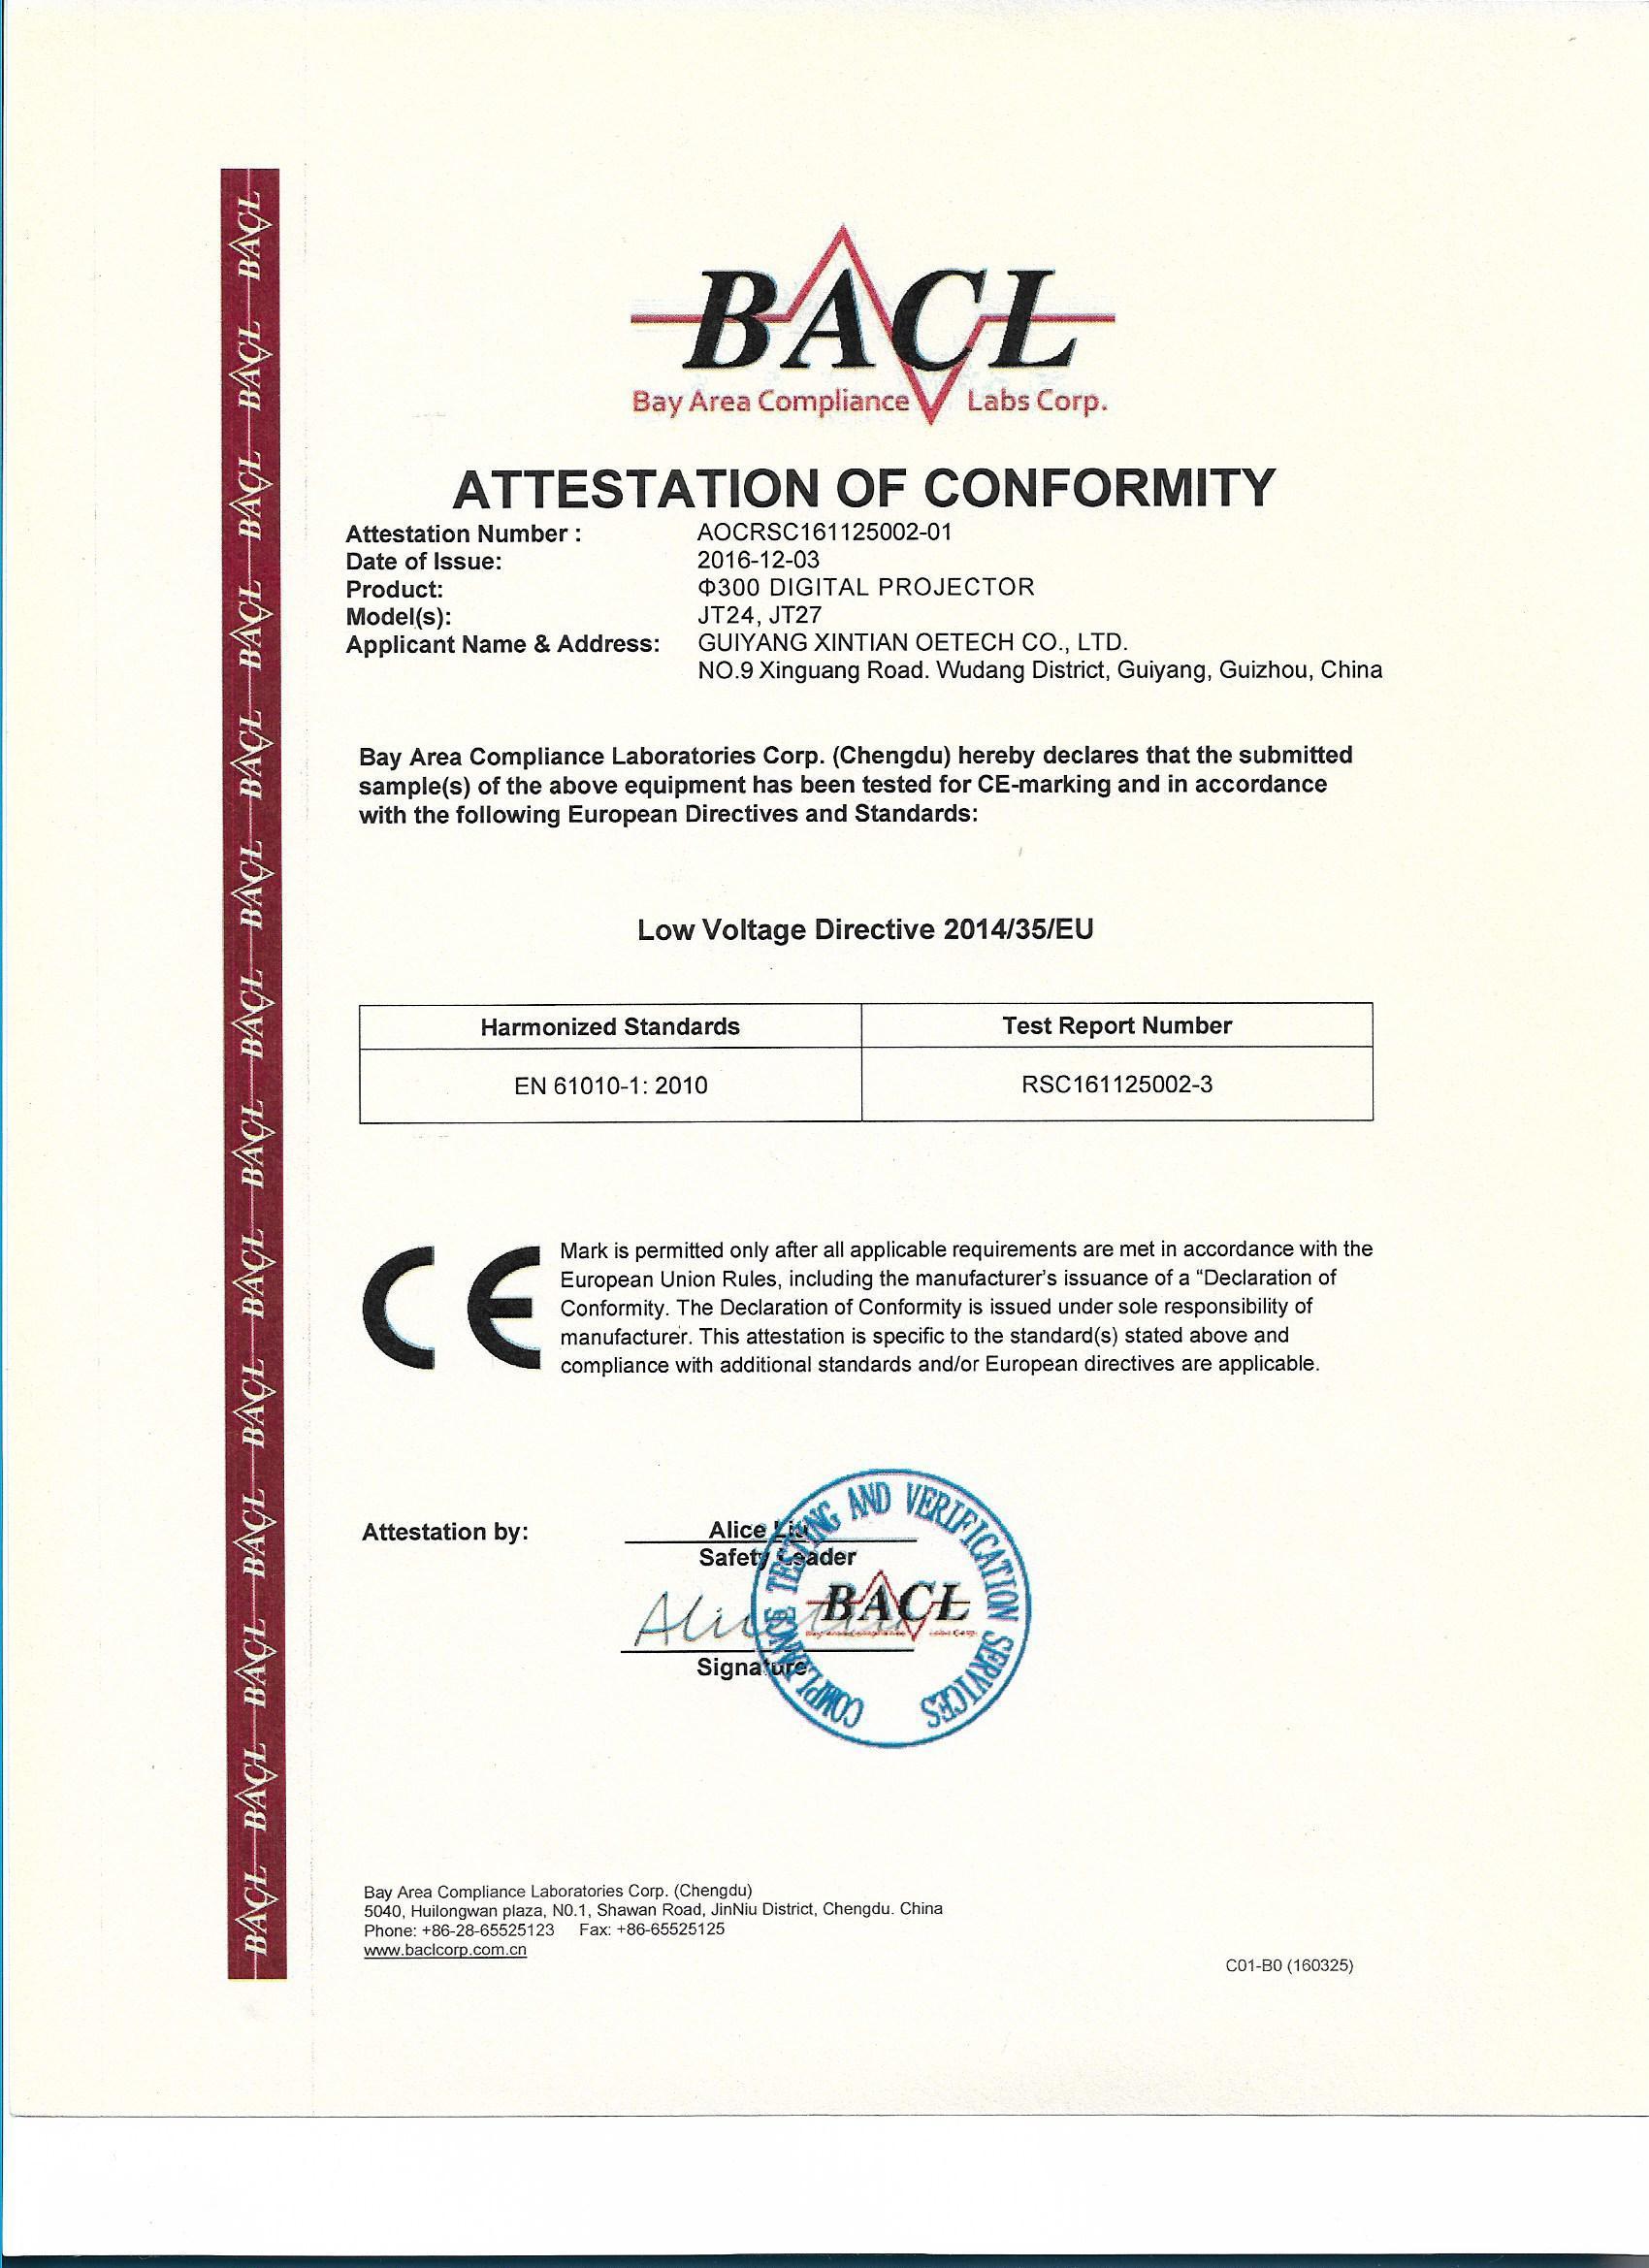 Universal Digital Horizontal Measuring Profile Projector (JT24: 300mm, 200mmX80mm)